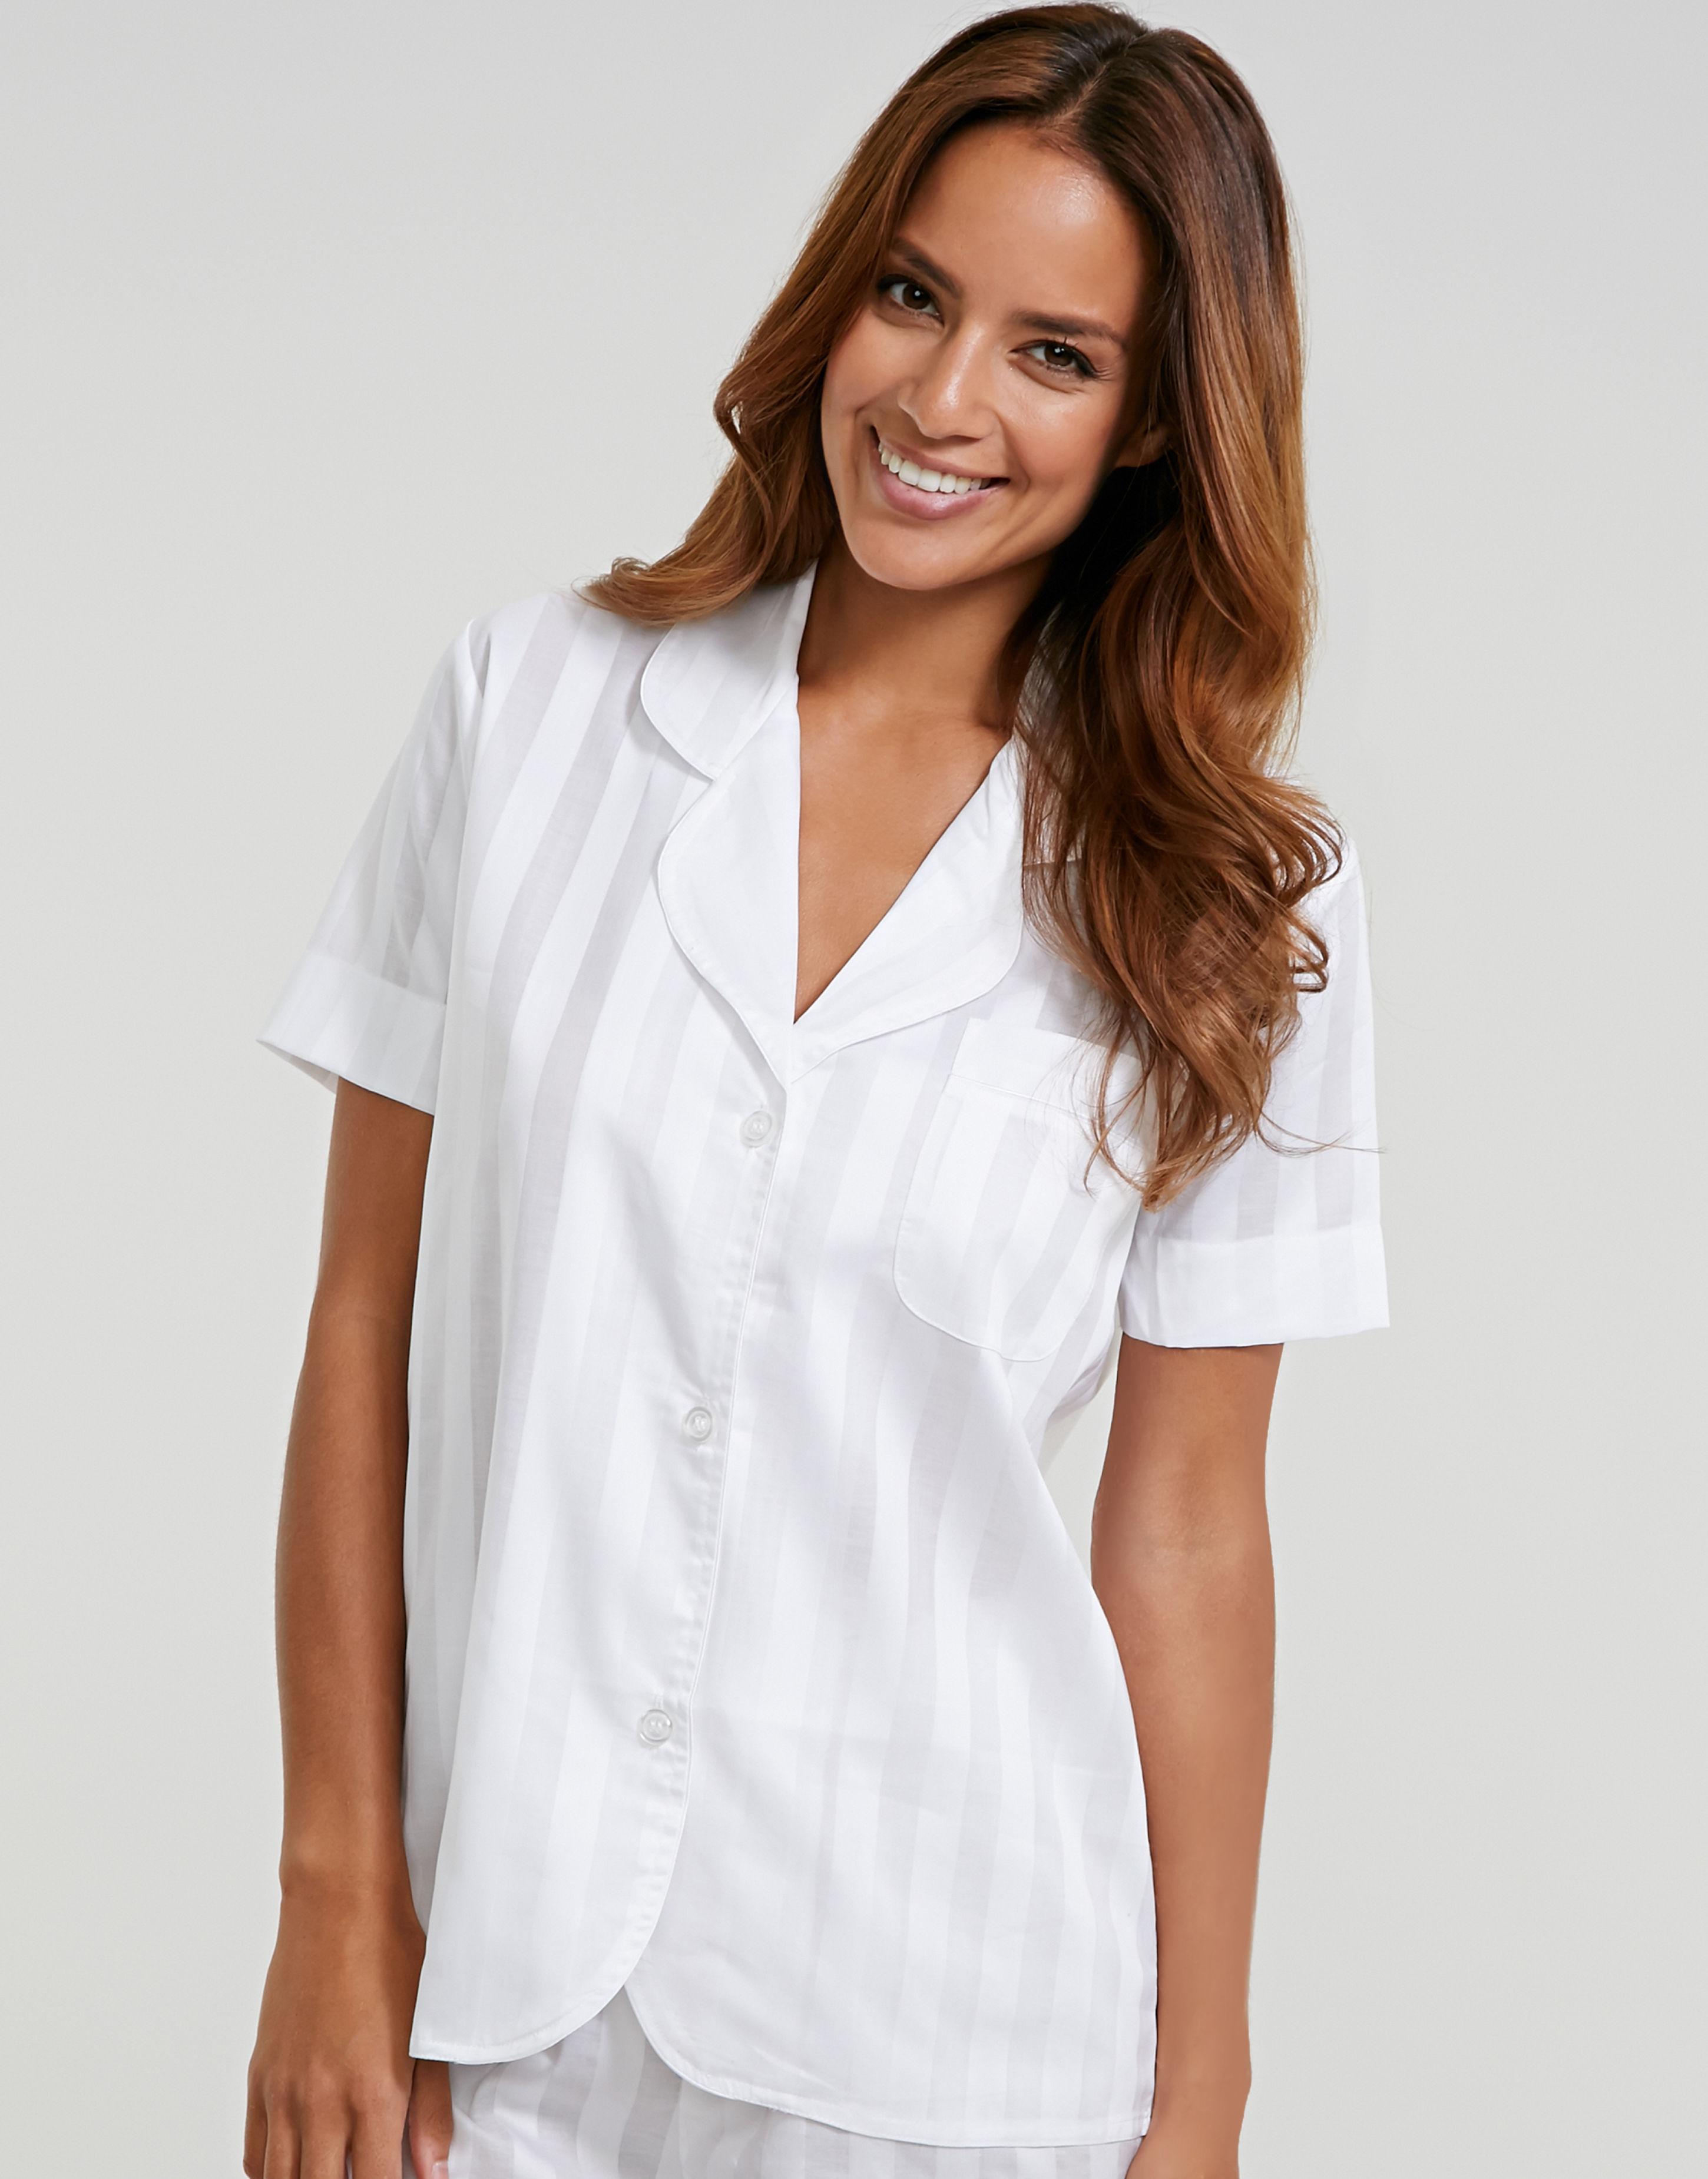 e5adb8cbe6 Bodas Cotton Nightwear Short Sleeve Pj Top in White - Lyst